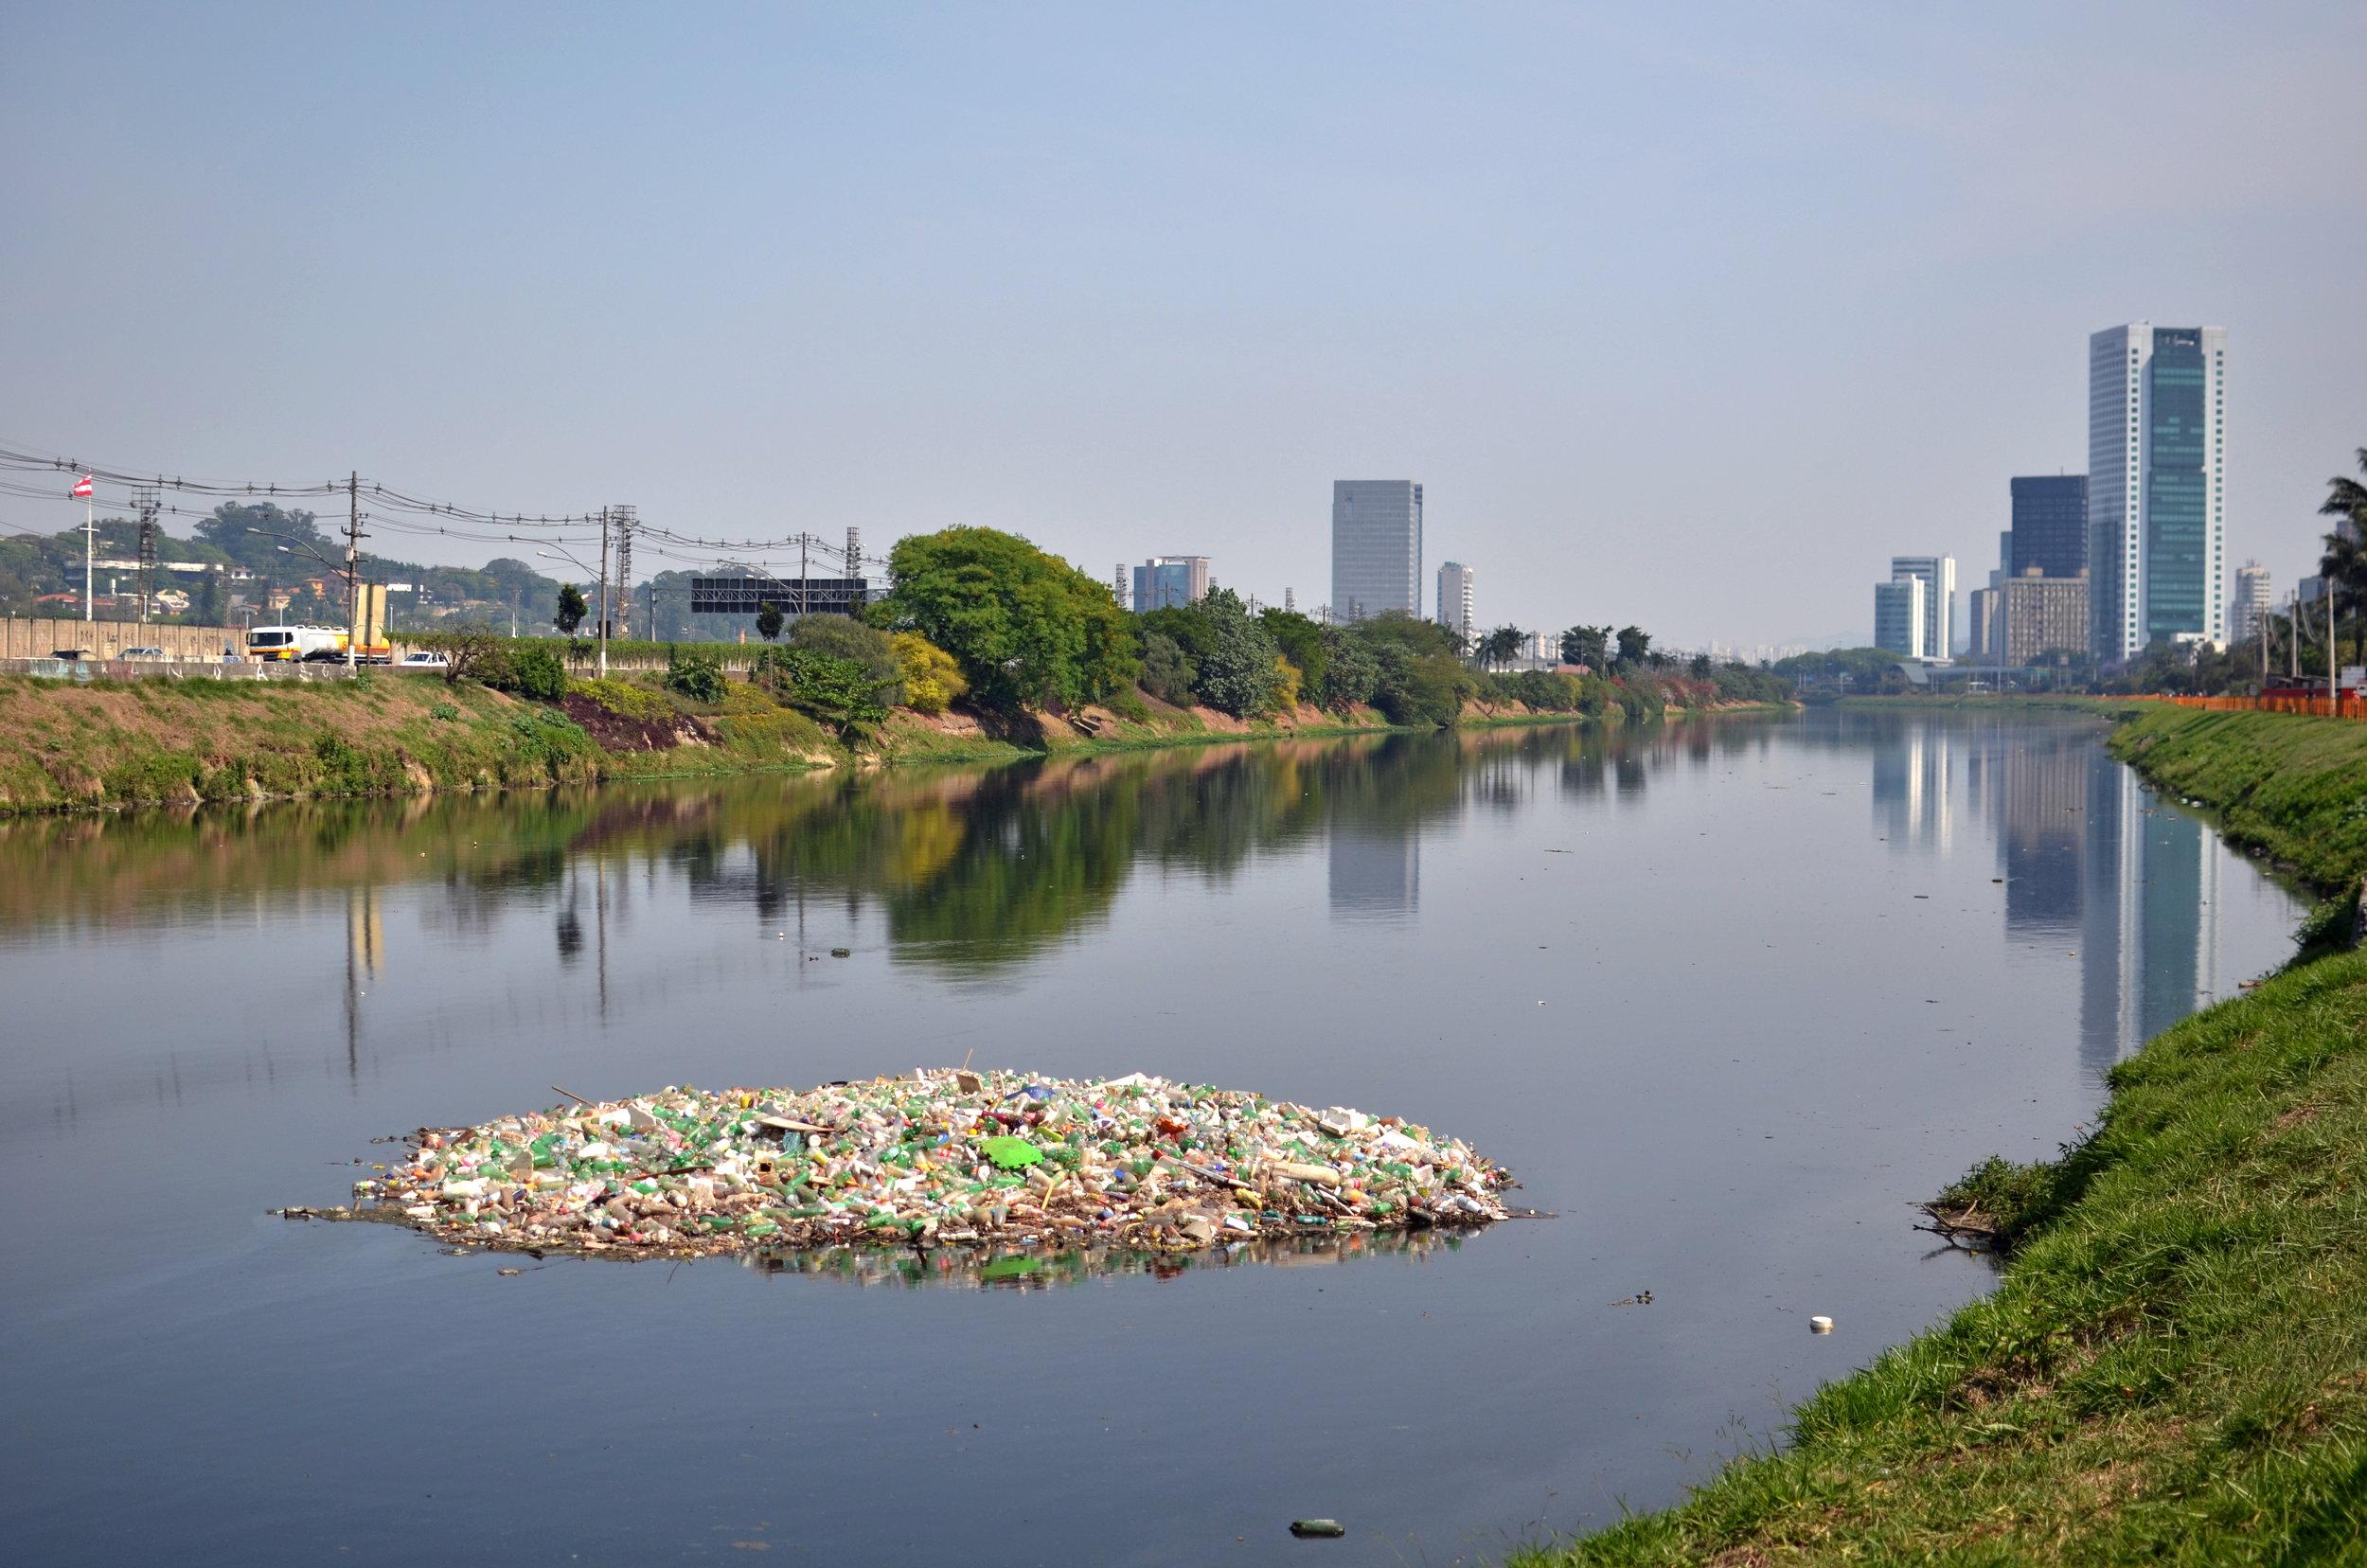 Ilha de lixo no Rip Pinheiros. Foto de Carlos Alkmin.